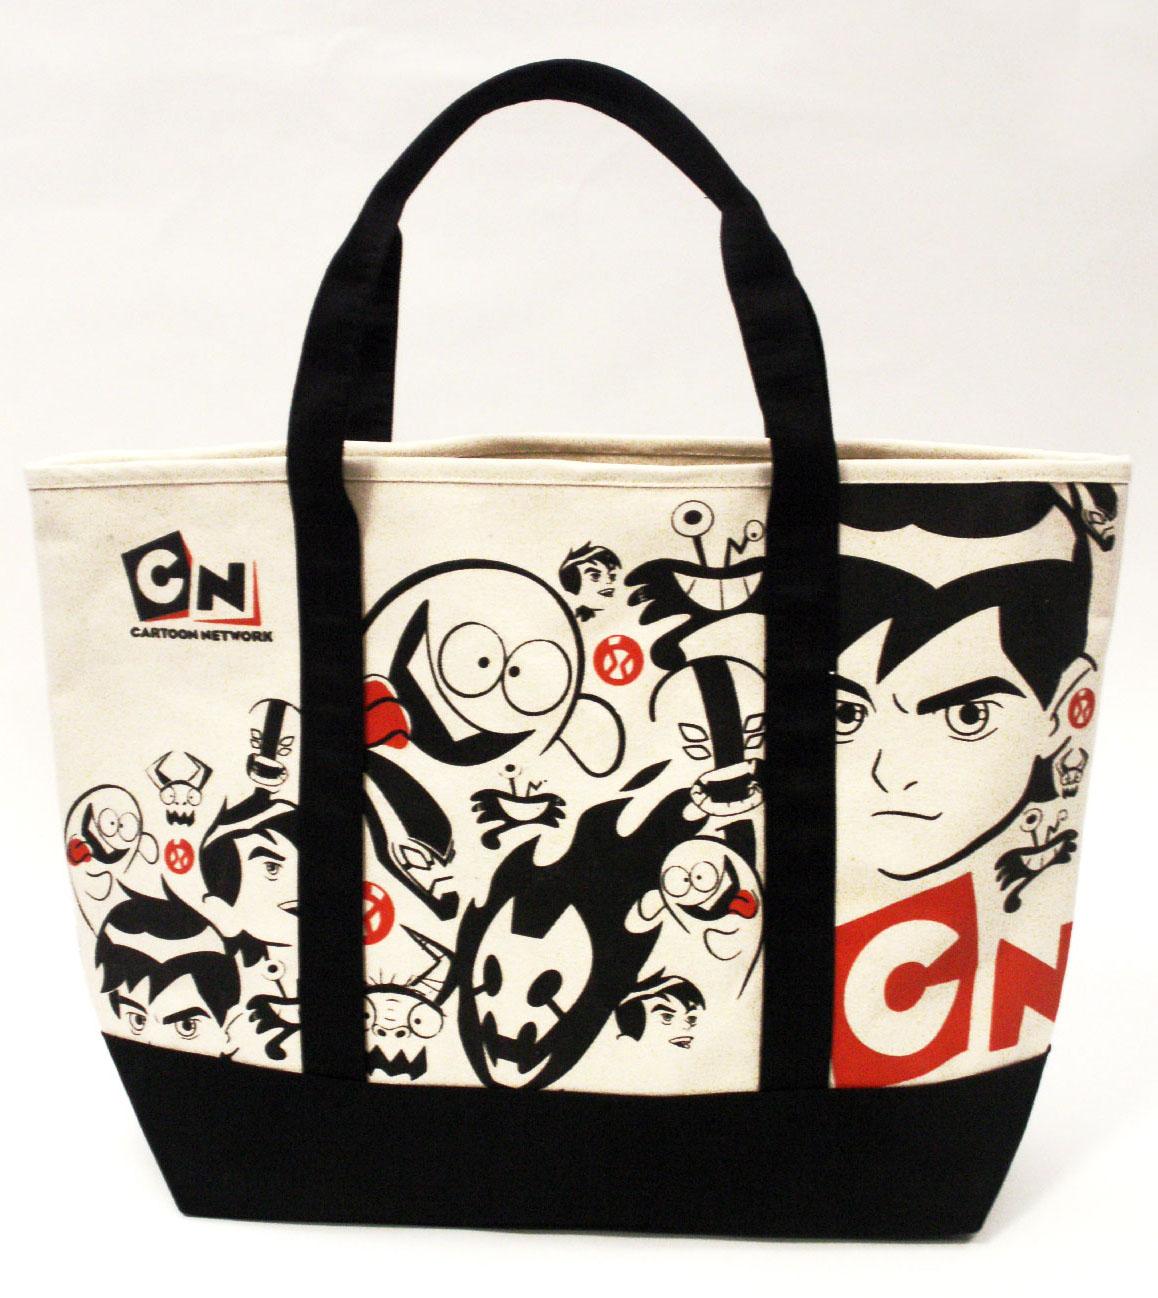 Cartoon Network Custom Tote